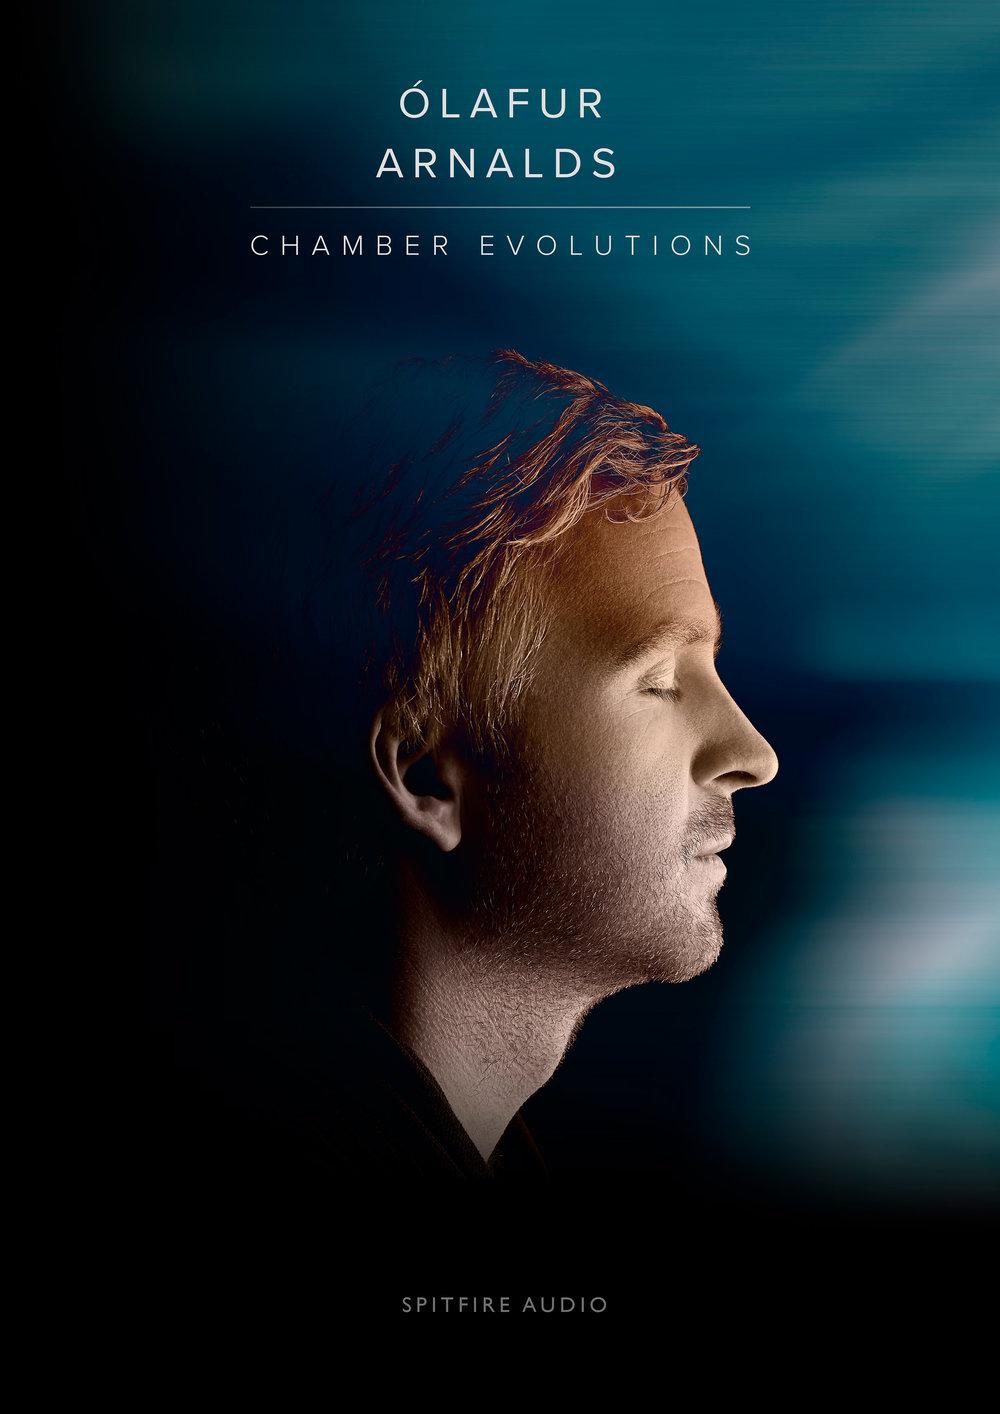 Lee Kirby Photography Olafur Arnalds Chamber Evolutions Spitfire Audio00001.jpg